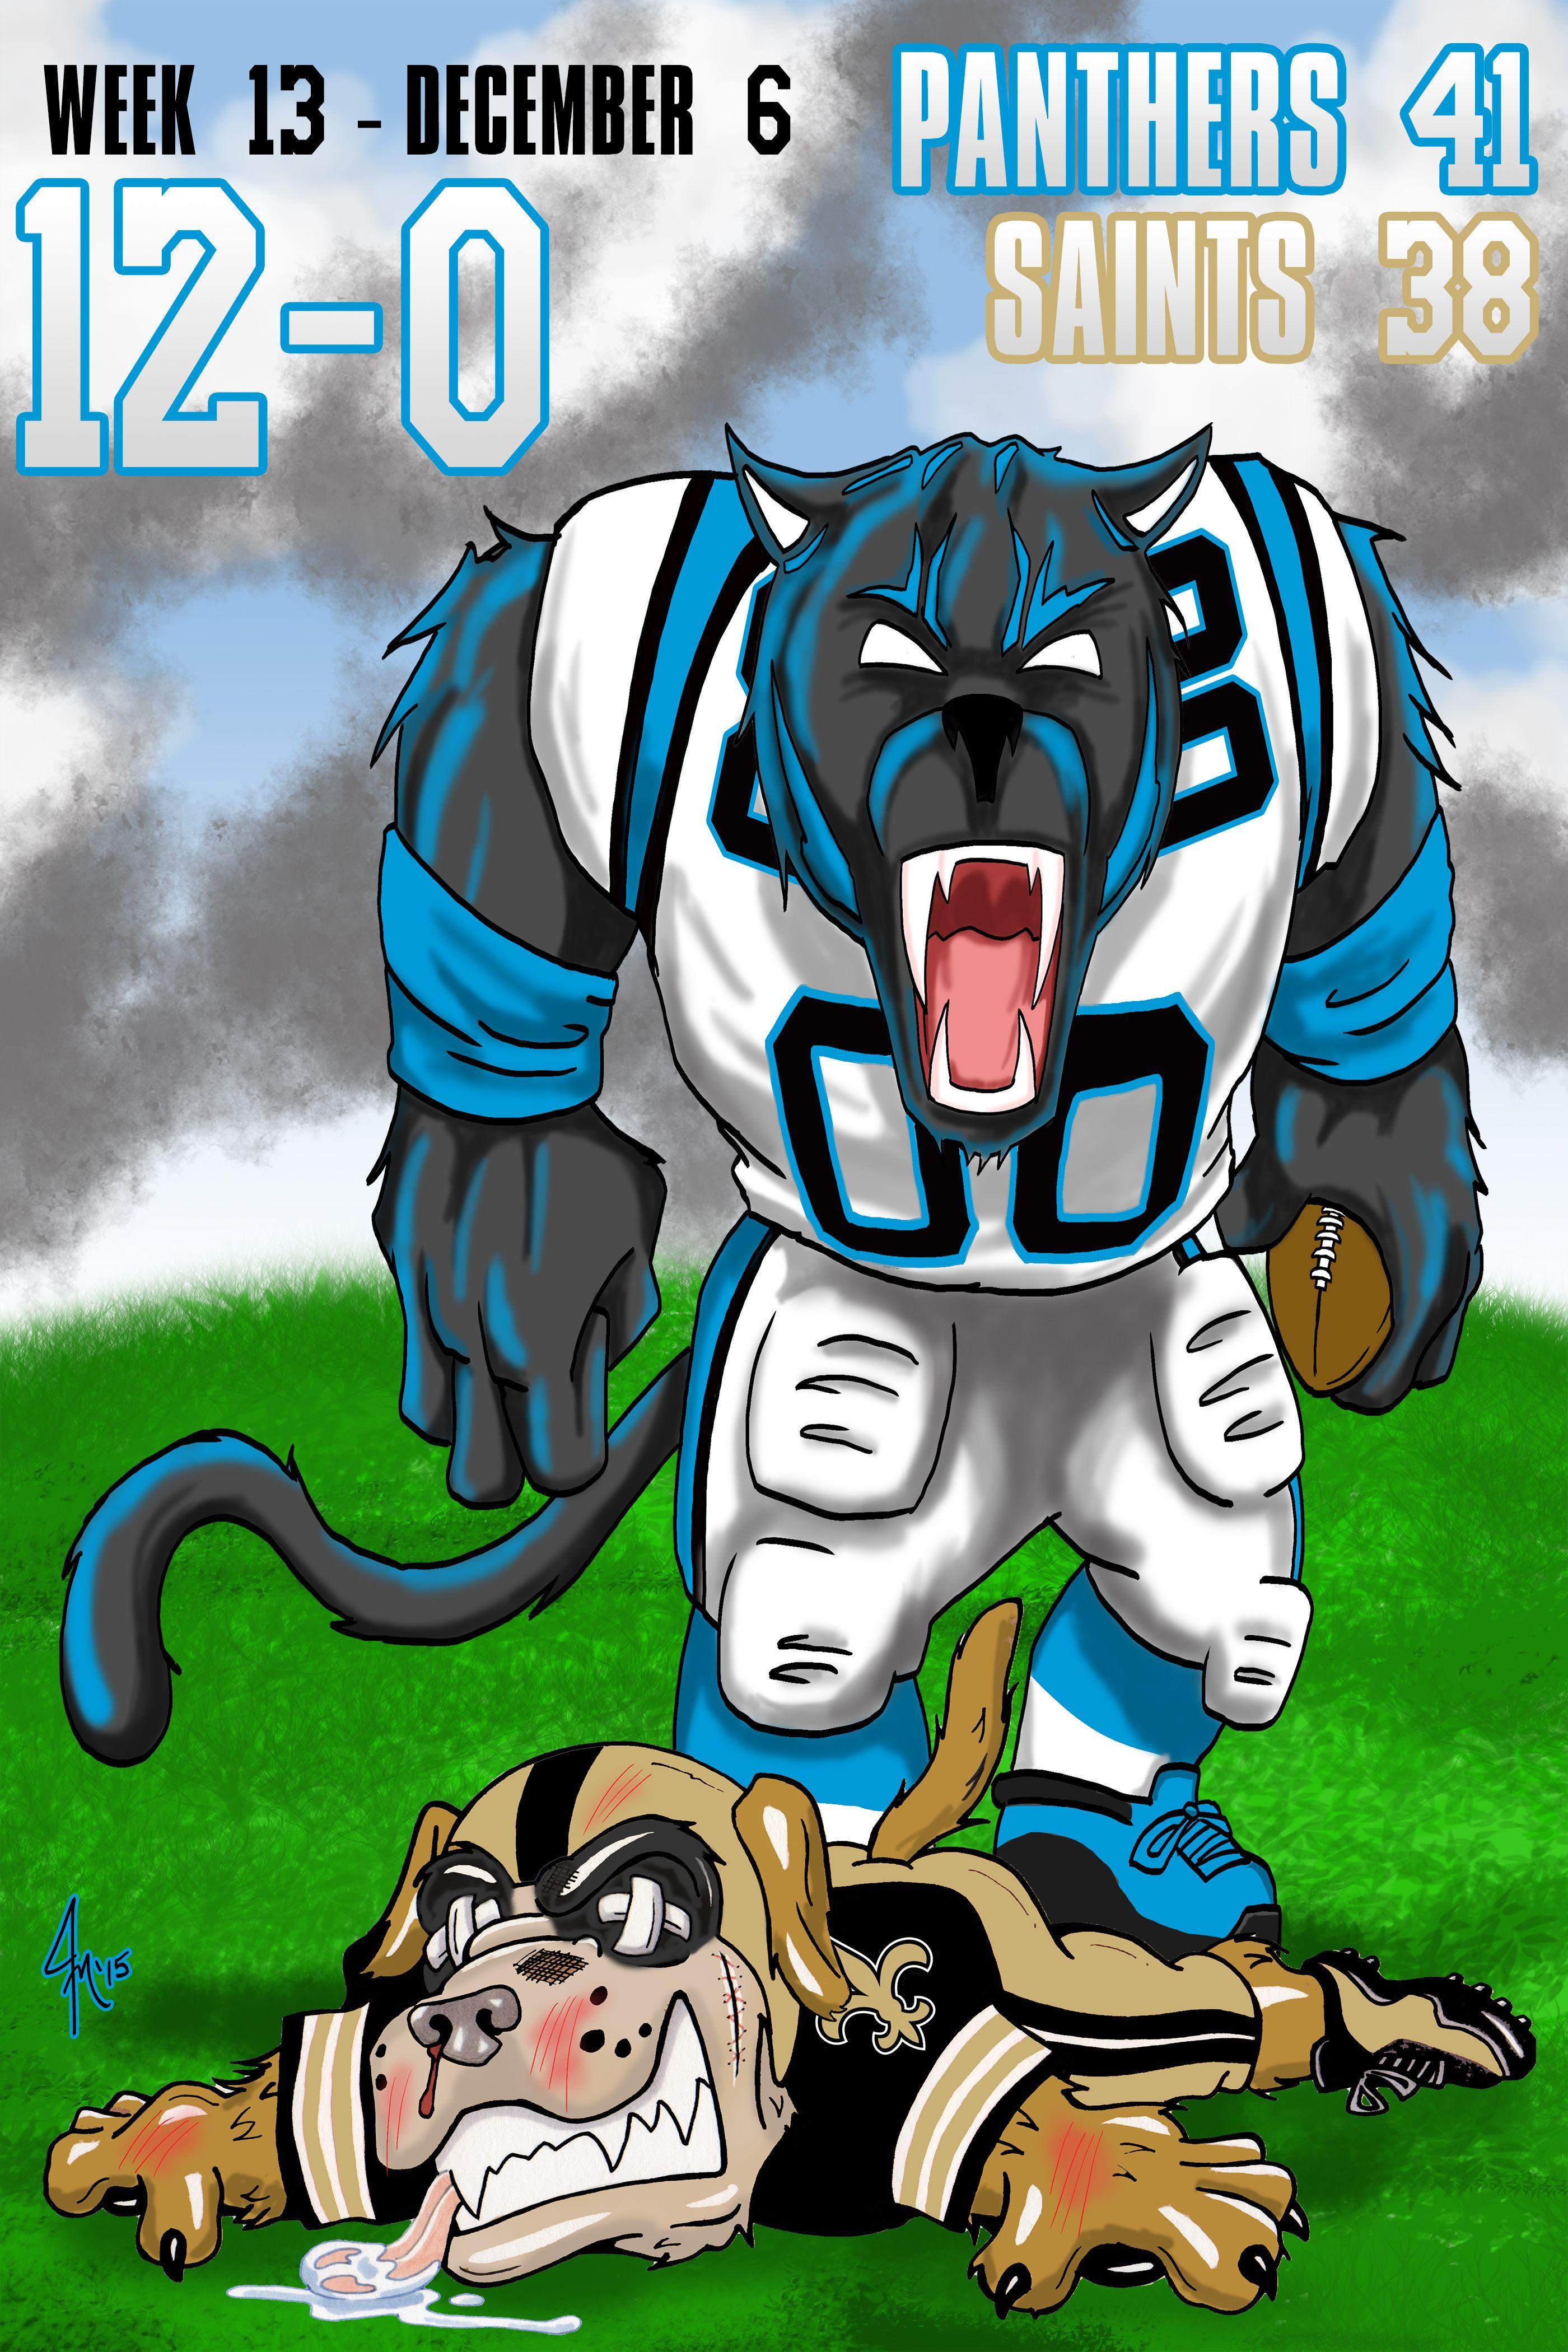 Carolina Panthers vs. New Orleans Saints Carolina